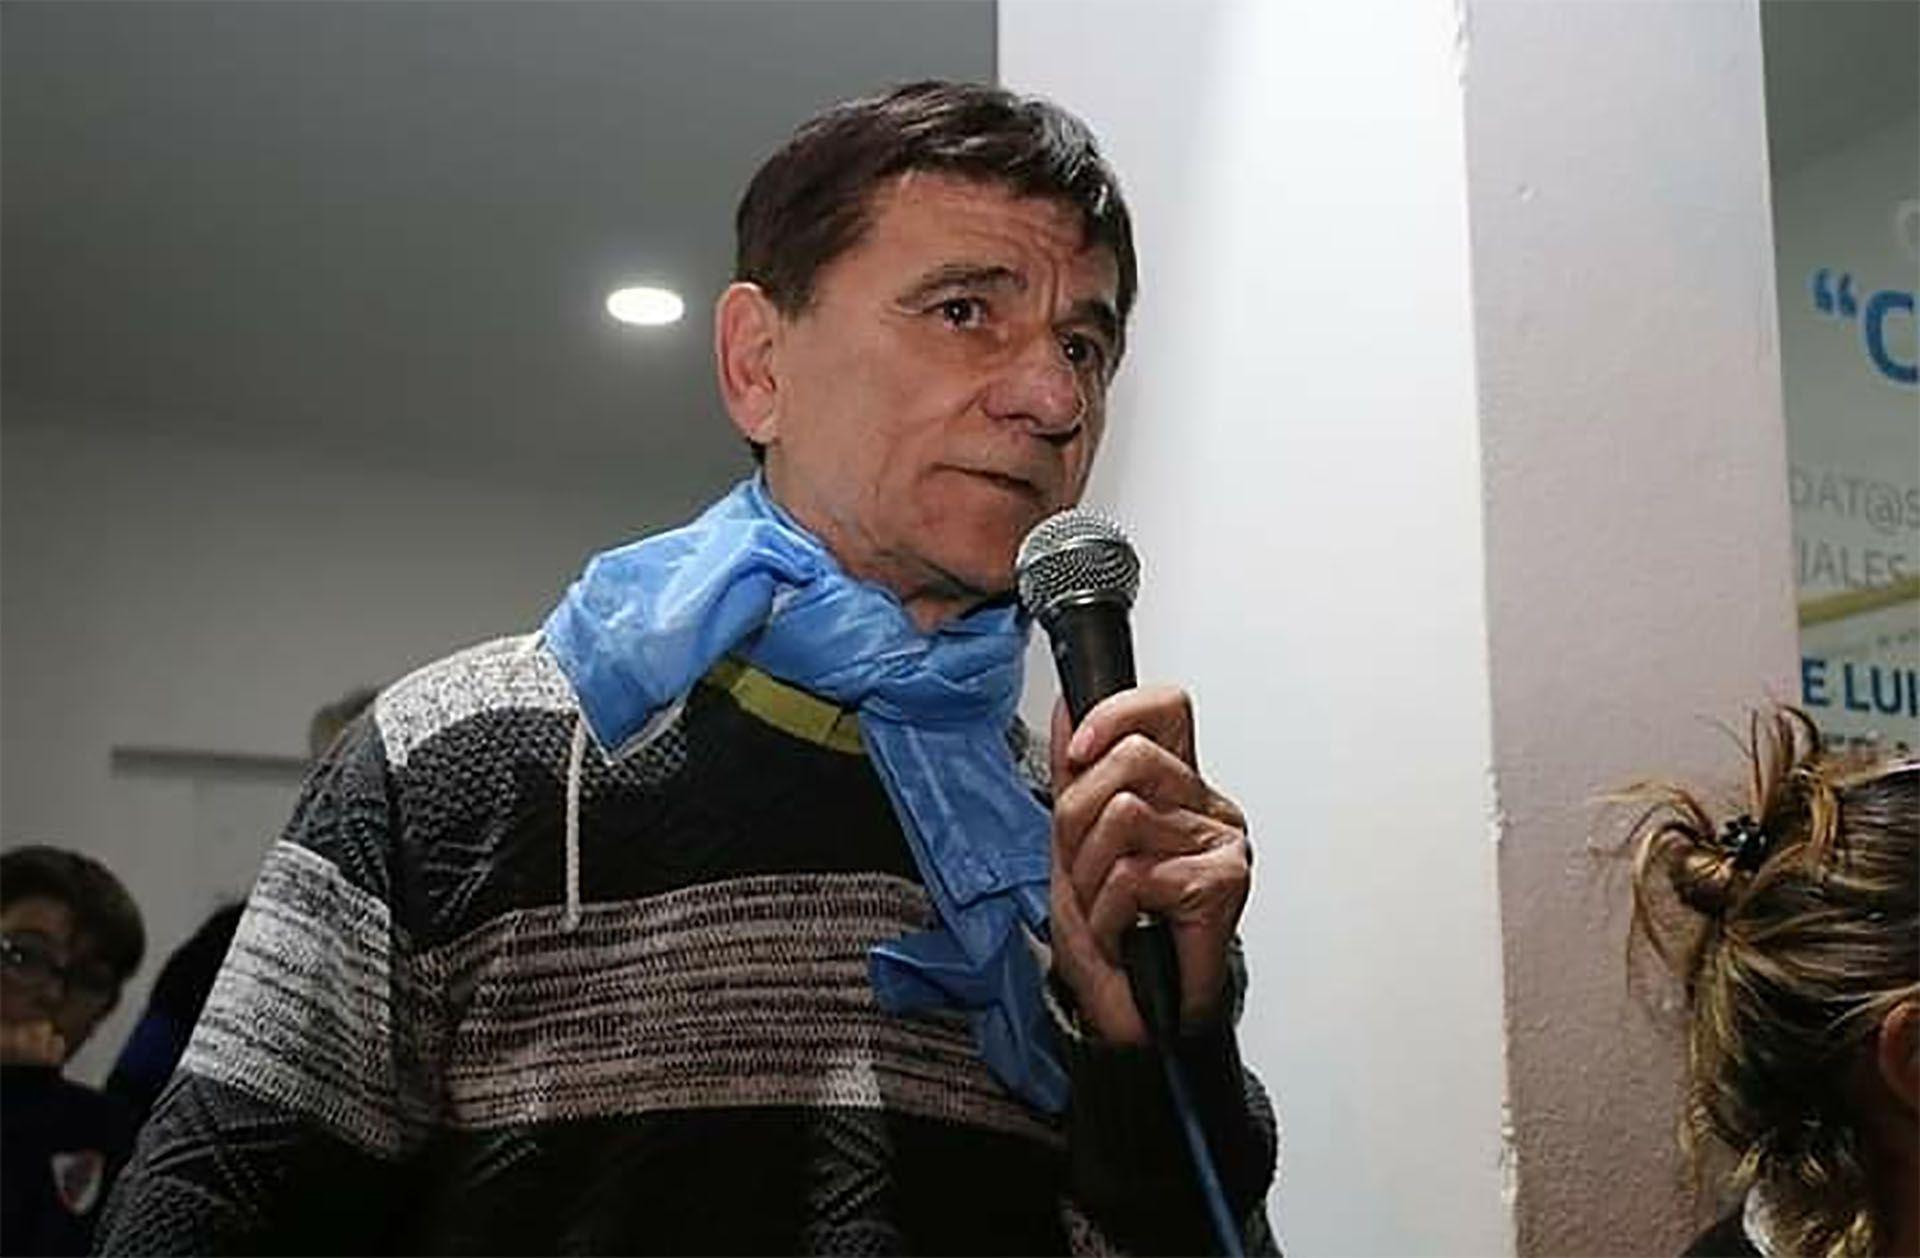 Gasparini es intendente de Roque Pérez desde 2011